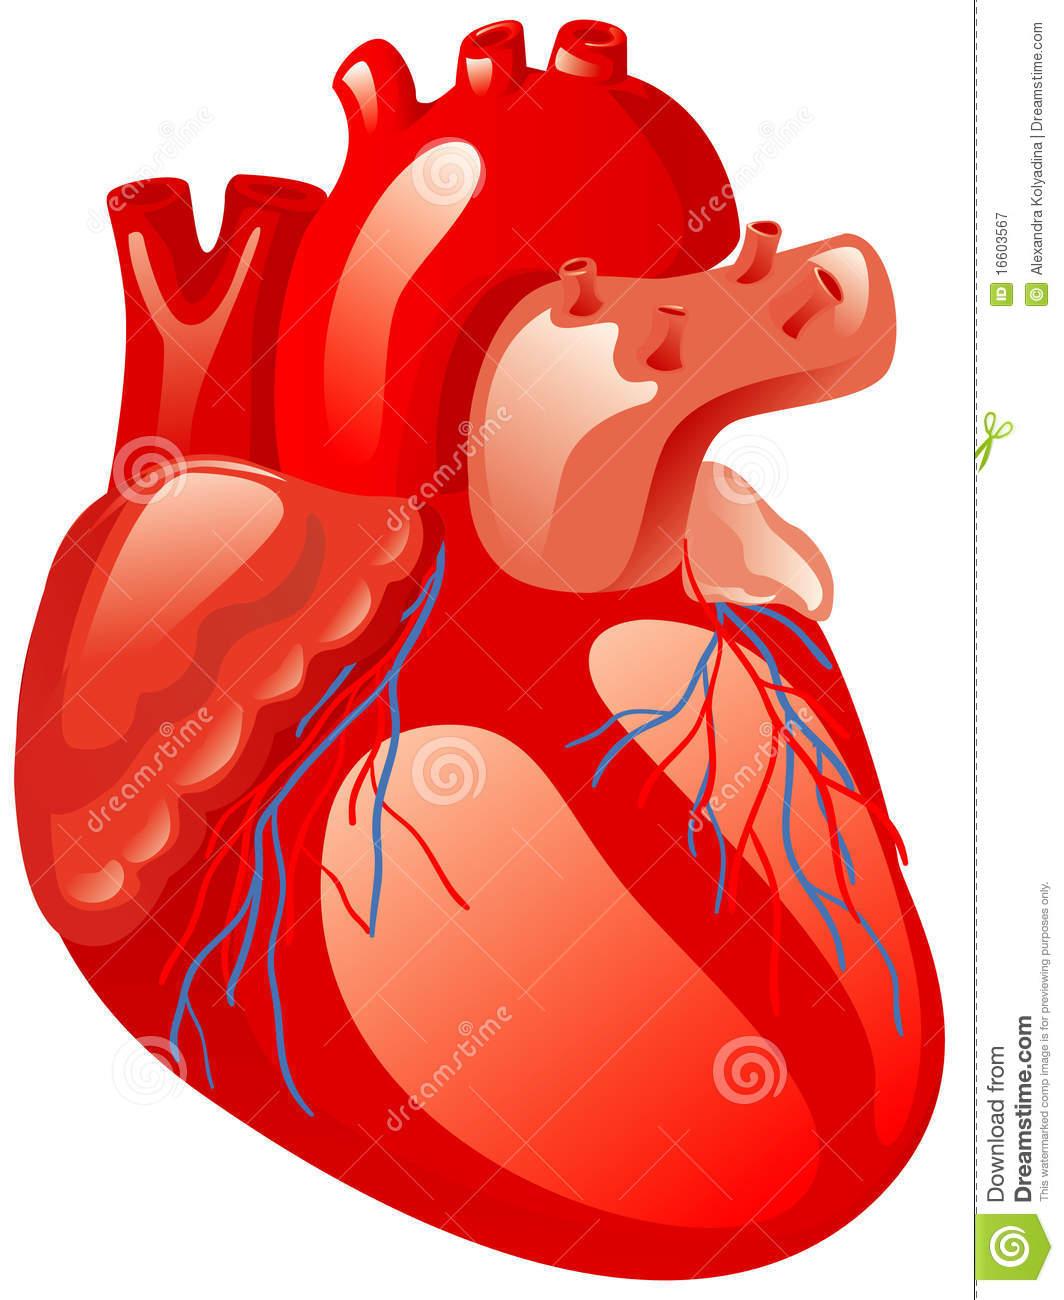 human heart clipart 20 free cliparts